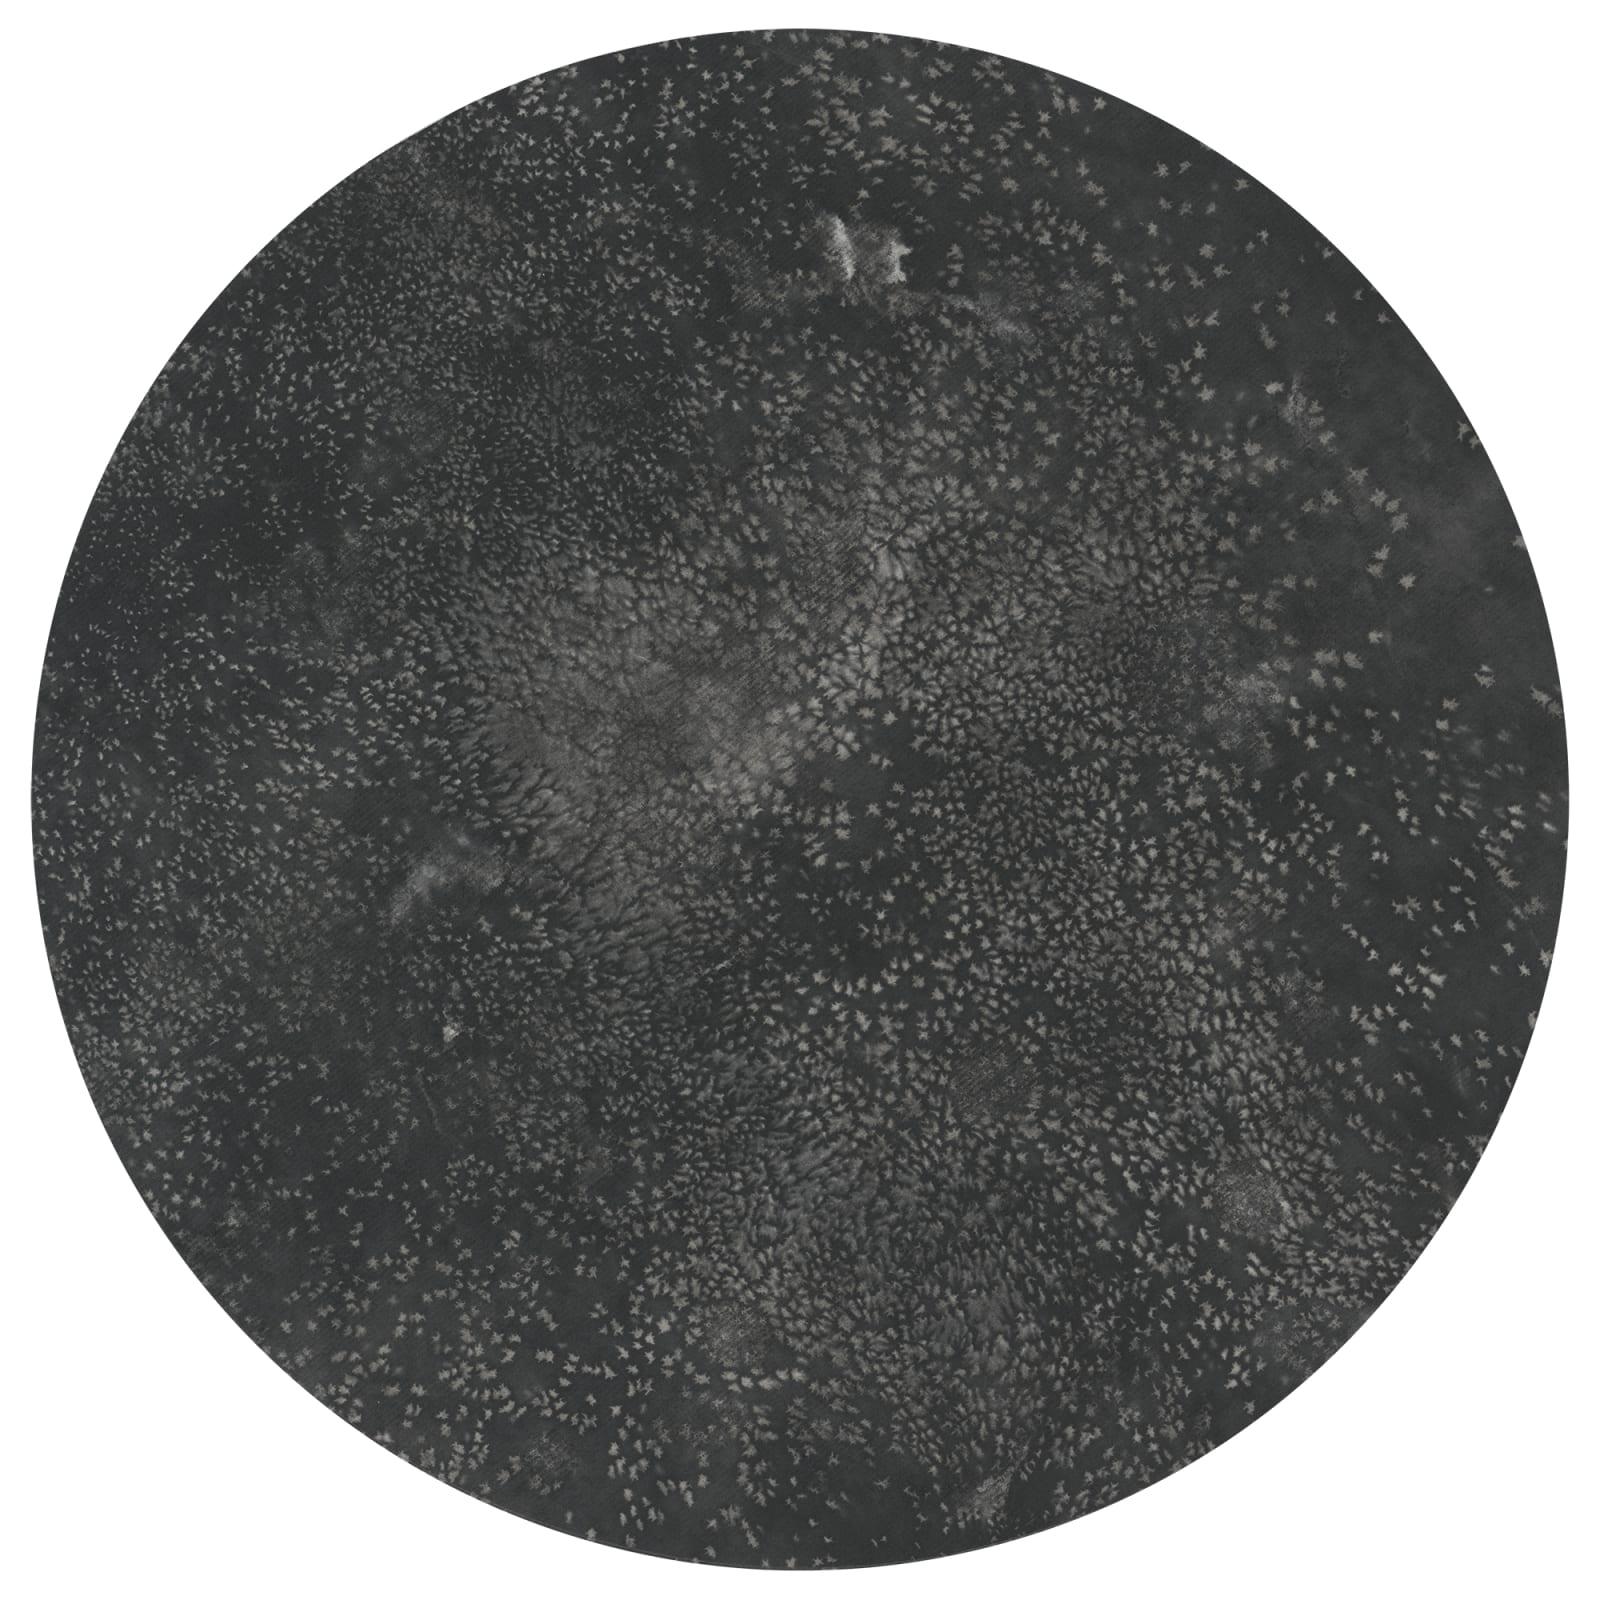 Bingyi 冰逸, Starry Sky 星空, 2018